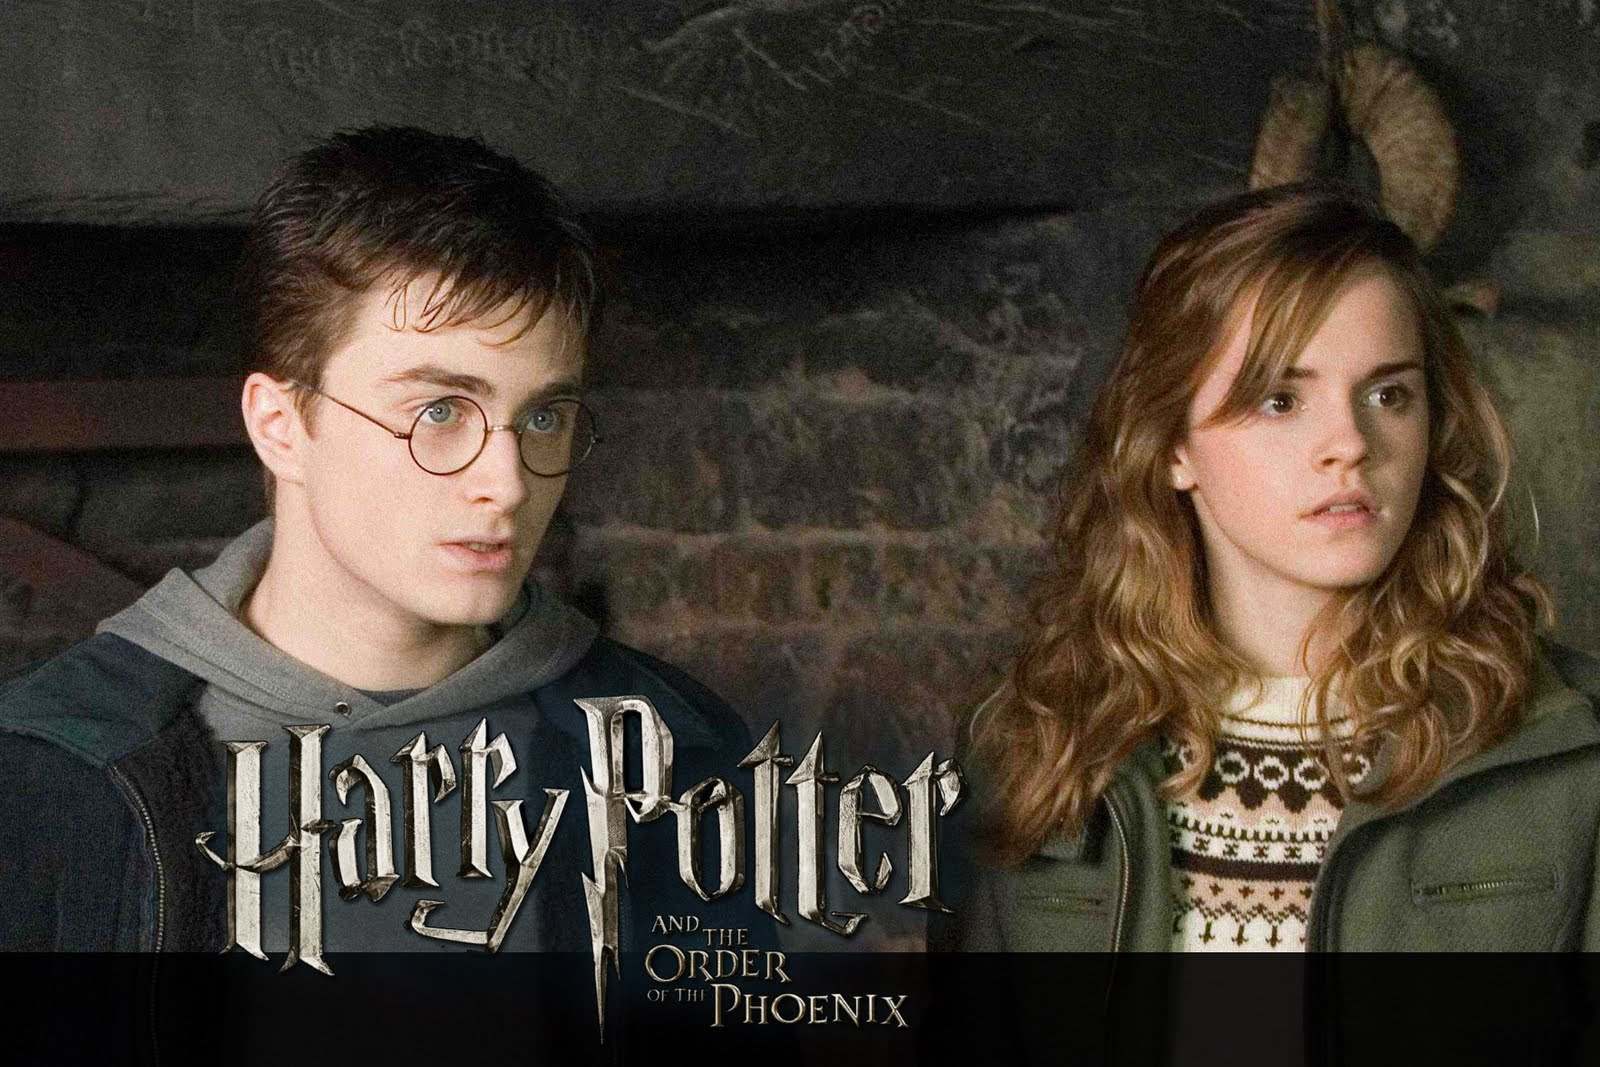 http://1.bp.blogspot.com/_--5tv0rYkQg/TI5TH3ZlETI/AAAAAAAAGag/spk3NV6ae-4/s1600/emma+watson+potter-hermione-granger.jpg